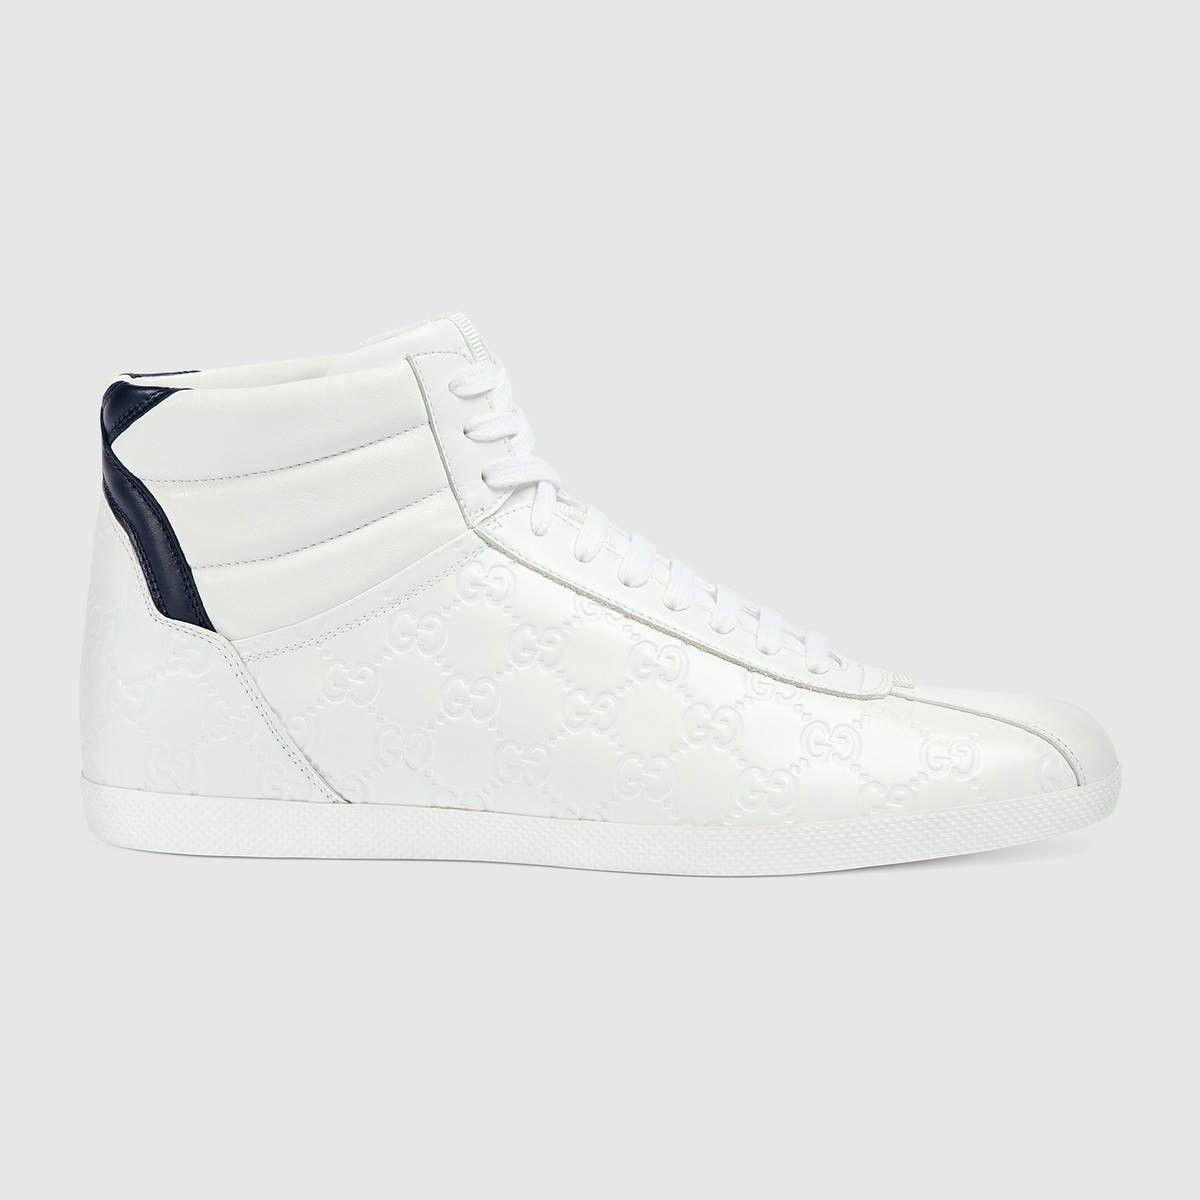 GUCCI Gucci Signature High-Top Sneaker - White Gucci Signature.  gucci   shoes  all 4b664f5075f1